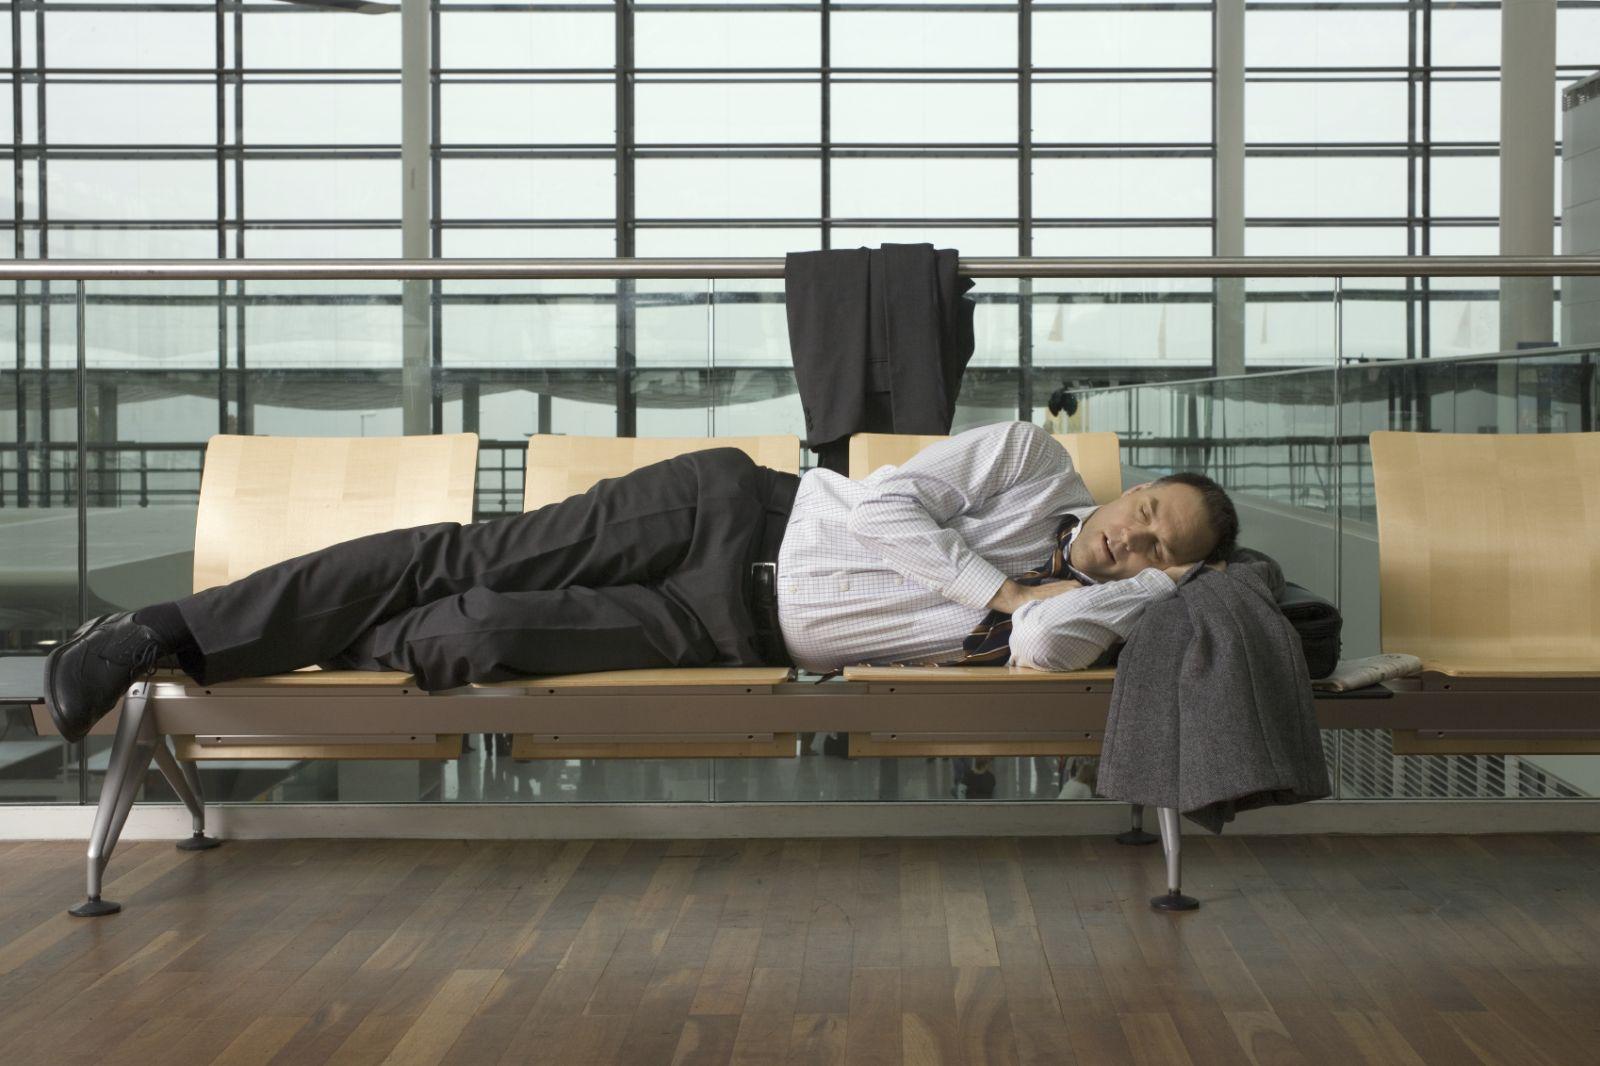 jet lag jet lagged airport travel